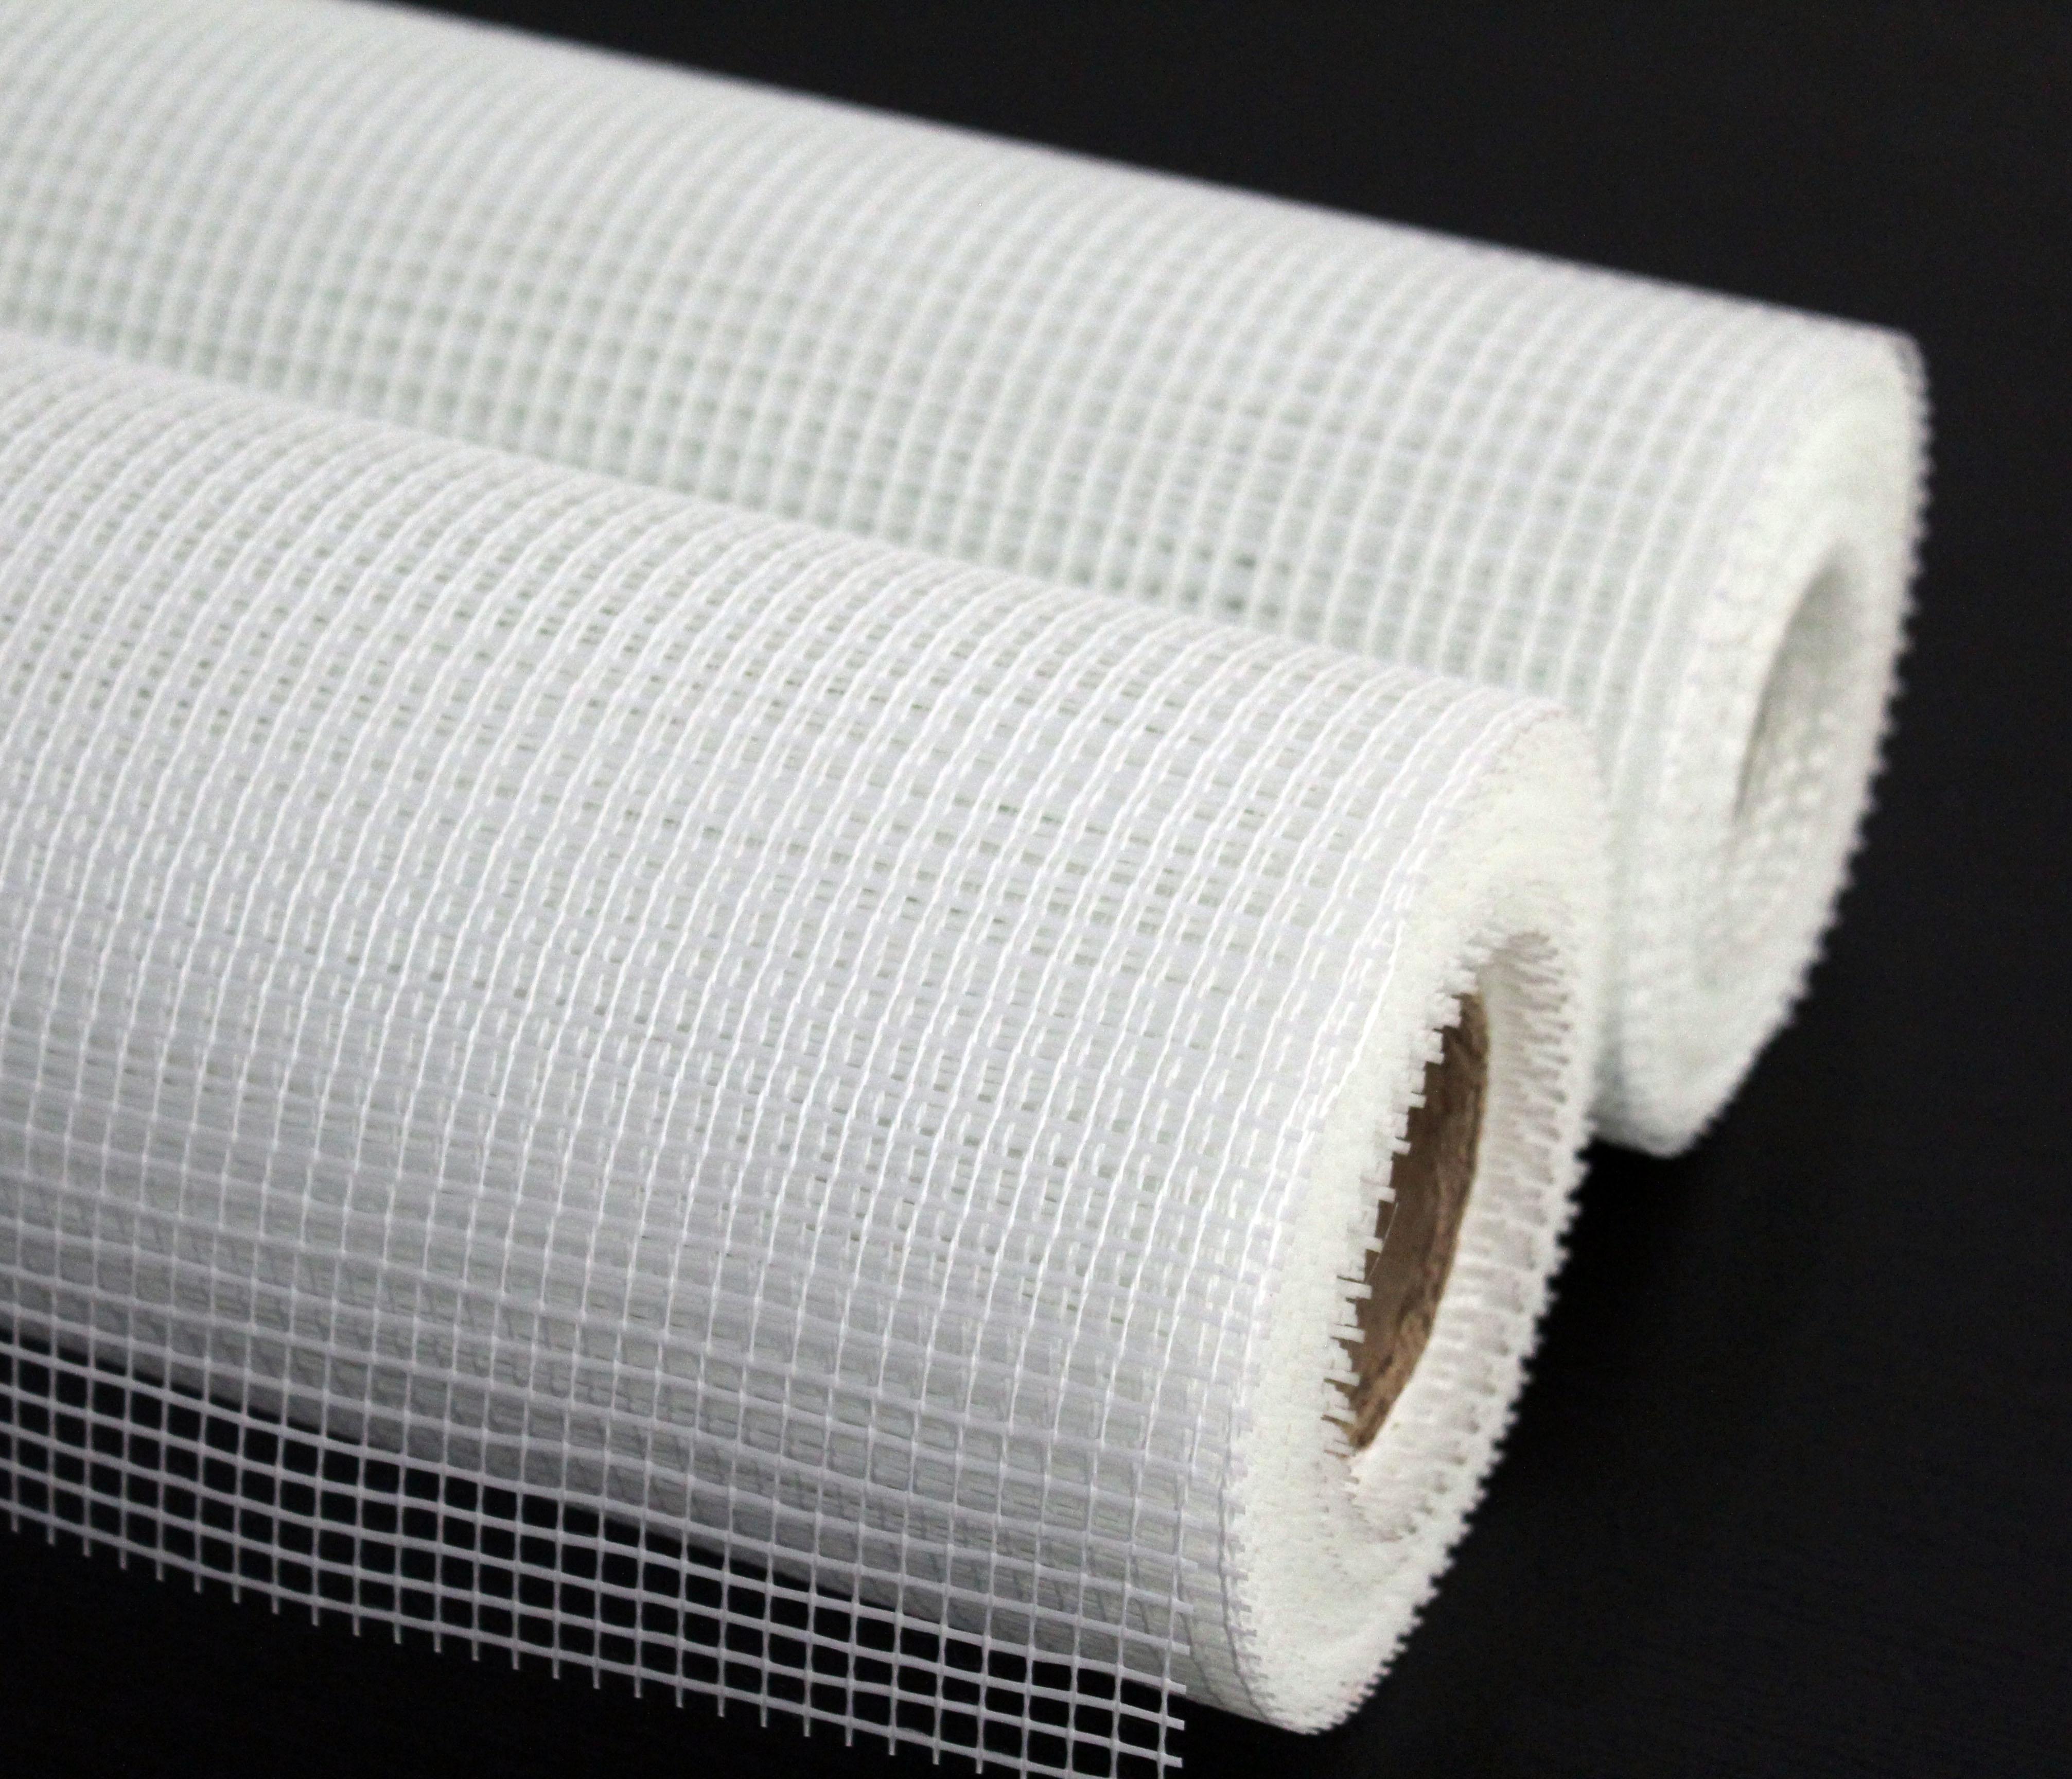 Roofing fiberglass mesh/fiberglass plaster net